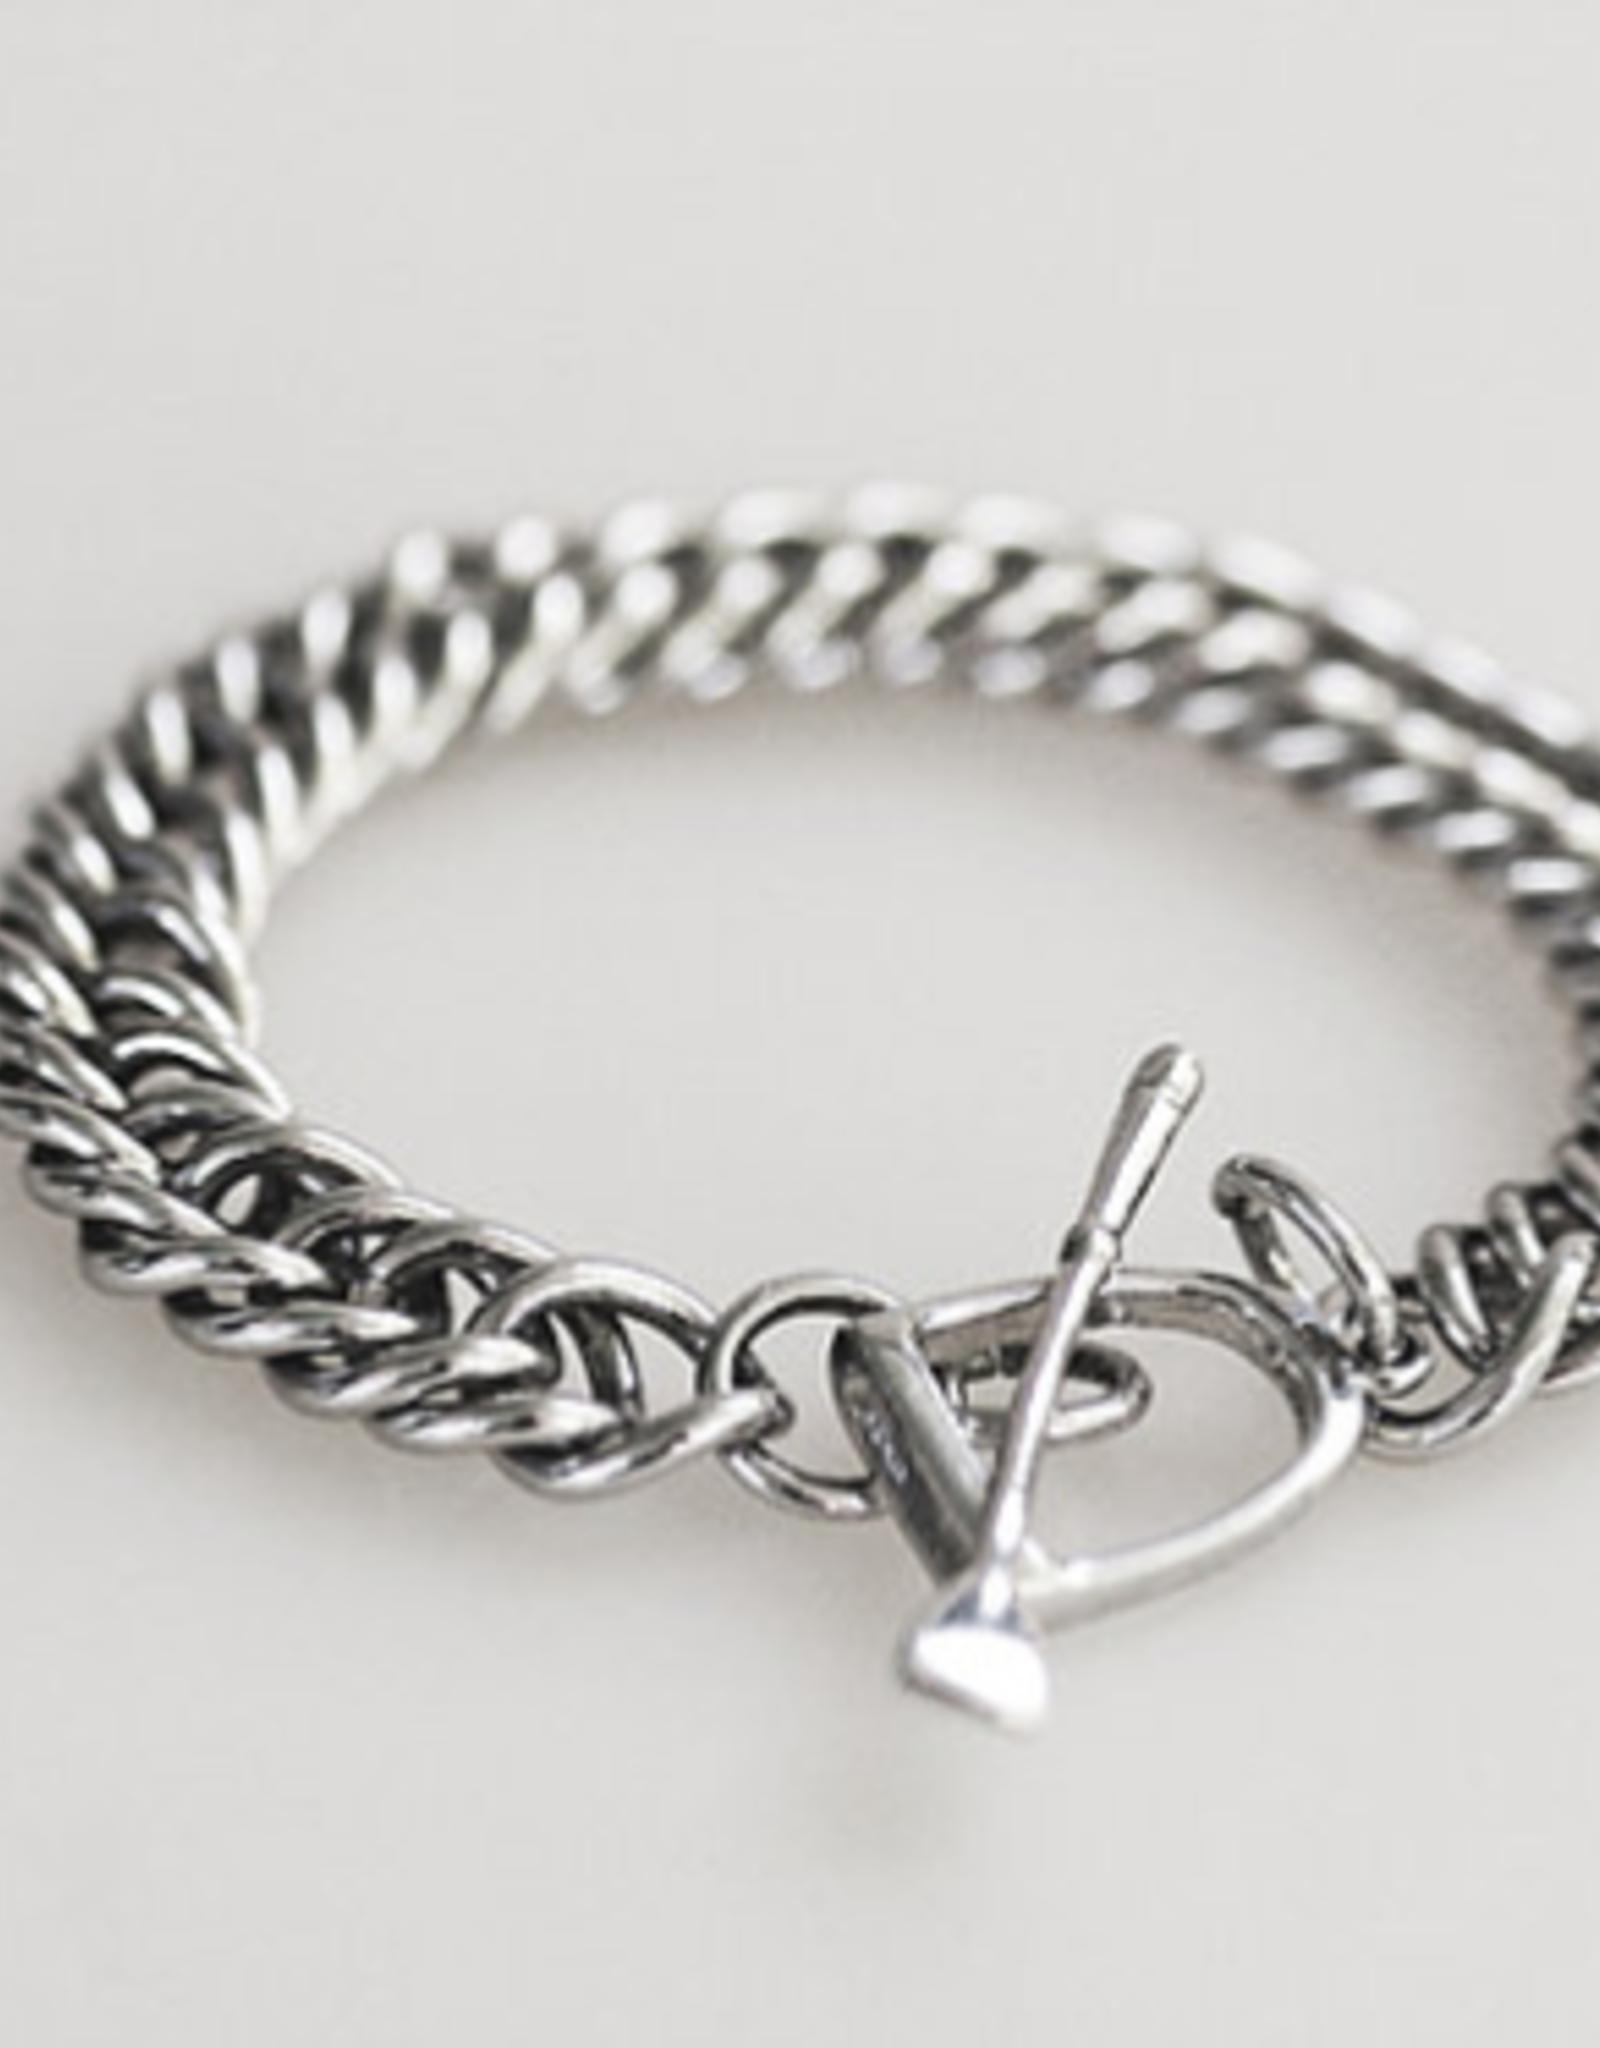 Michel McNabb Sterling Silver Curb Chain Bracelet